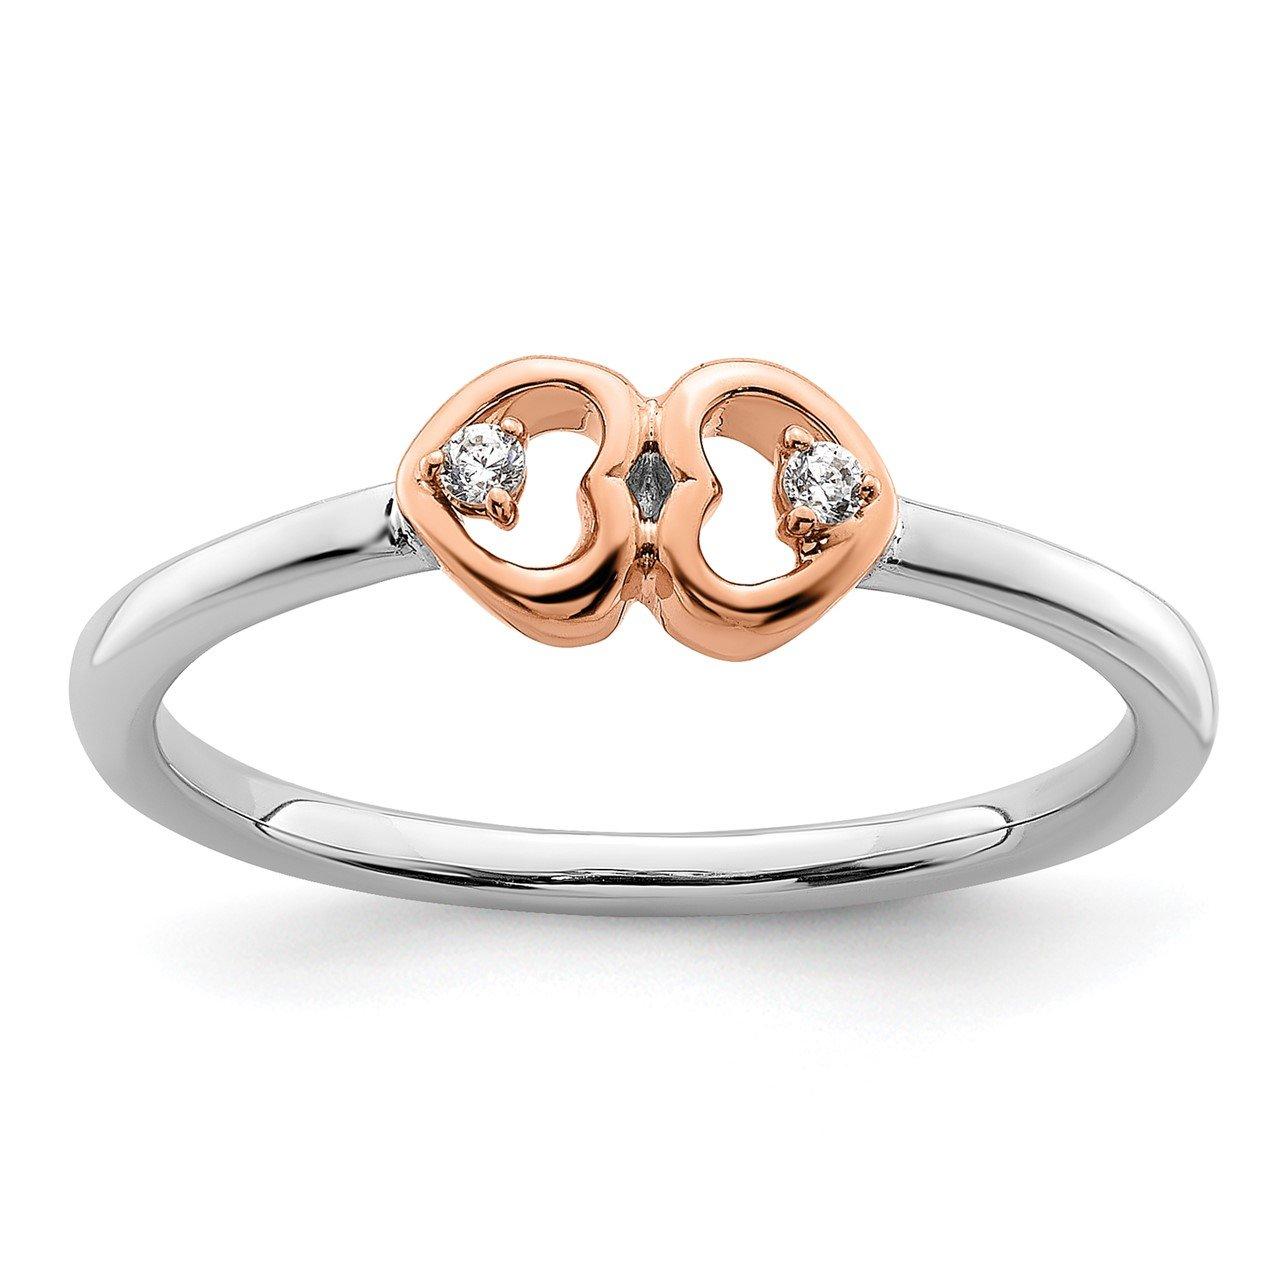 14ktt Lab Grown Diamond Si1/SI2, G H I, Hearts Promise Ring